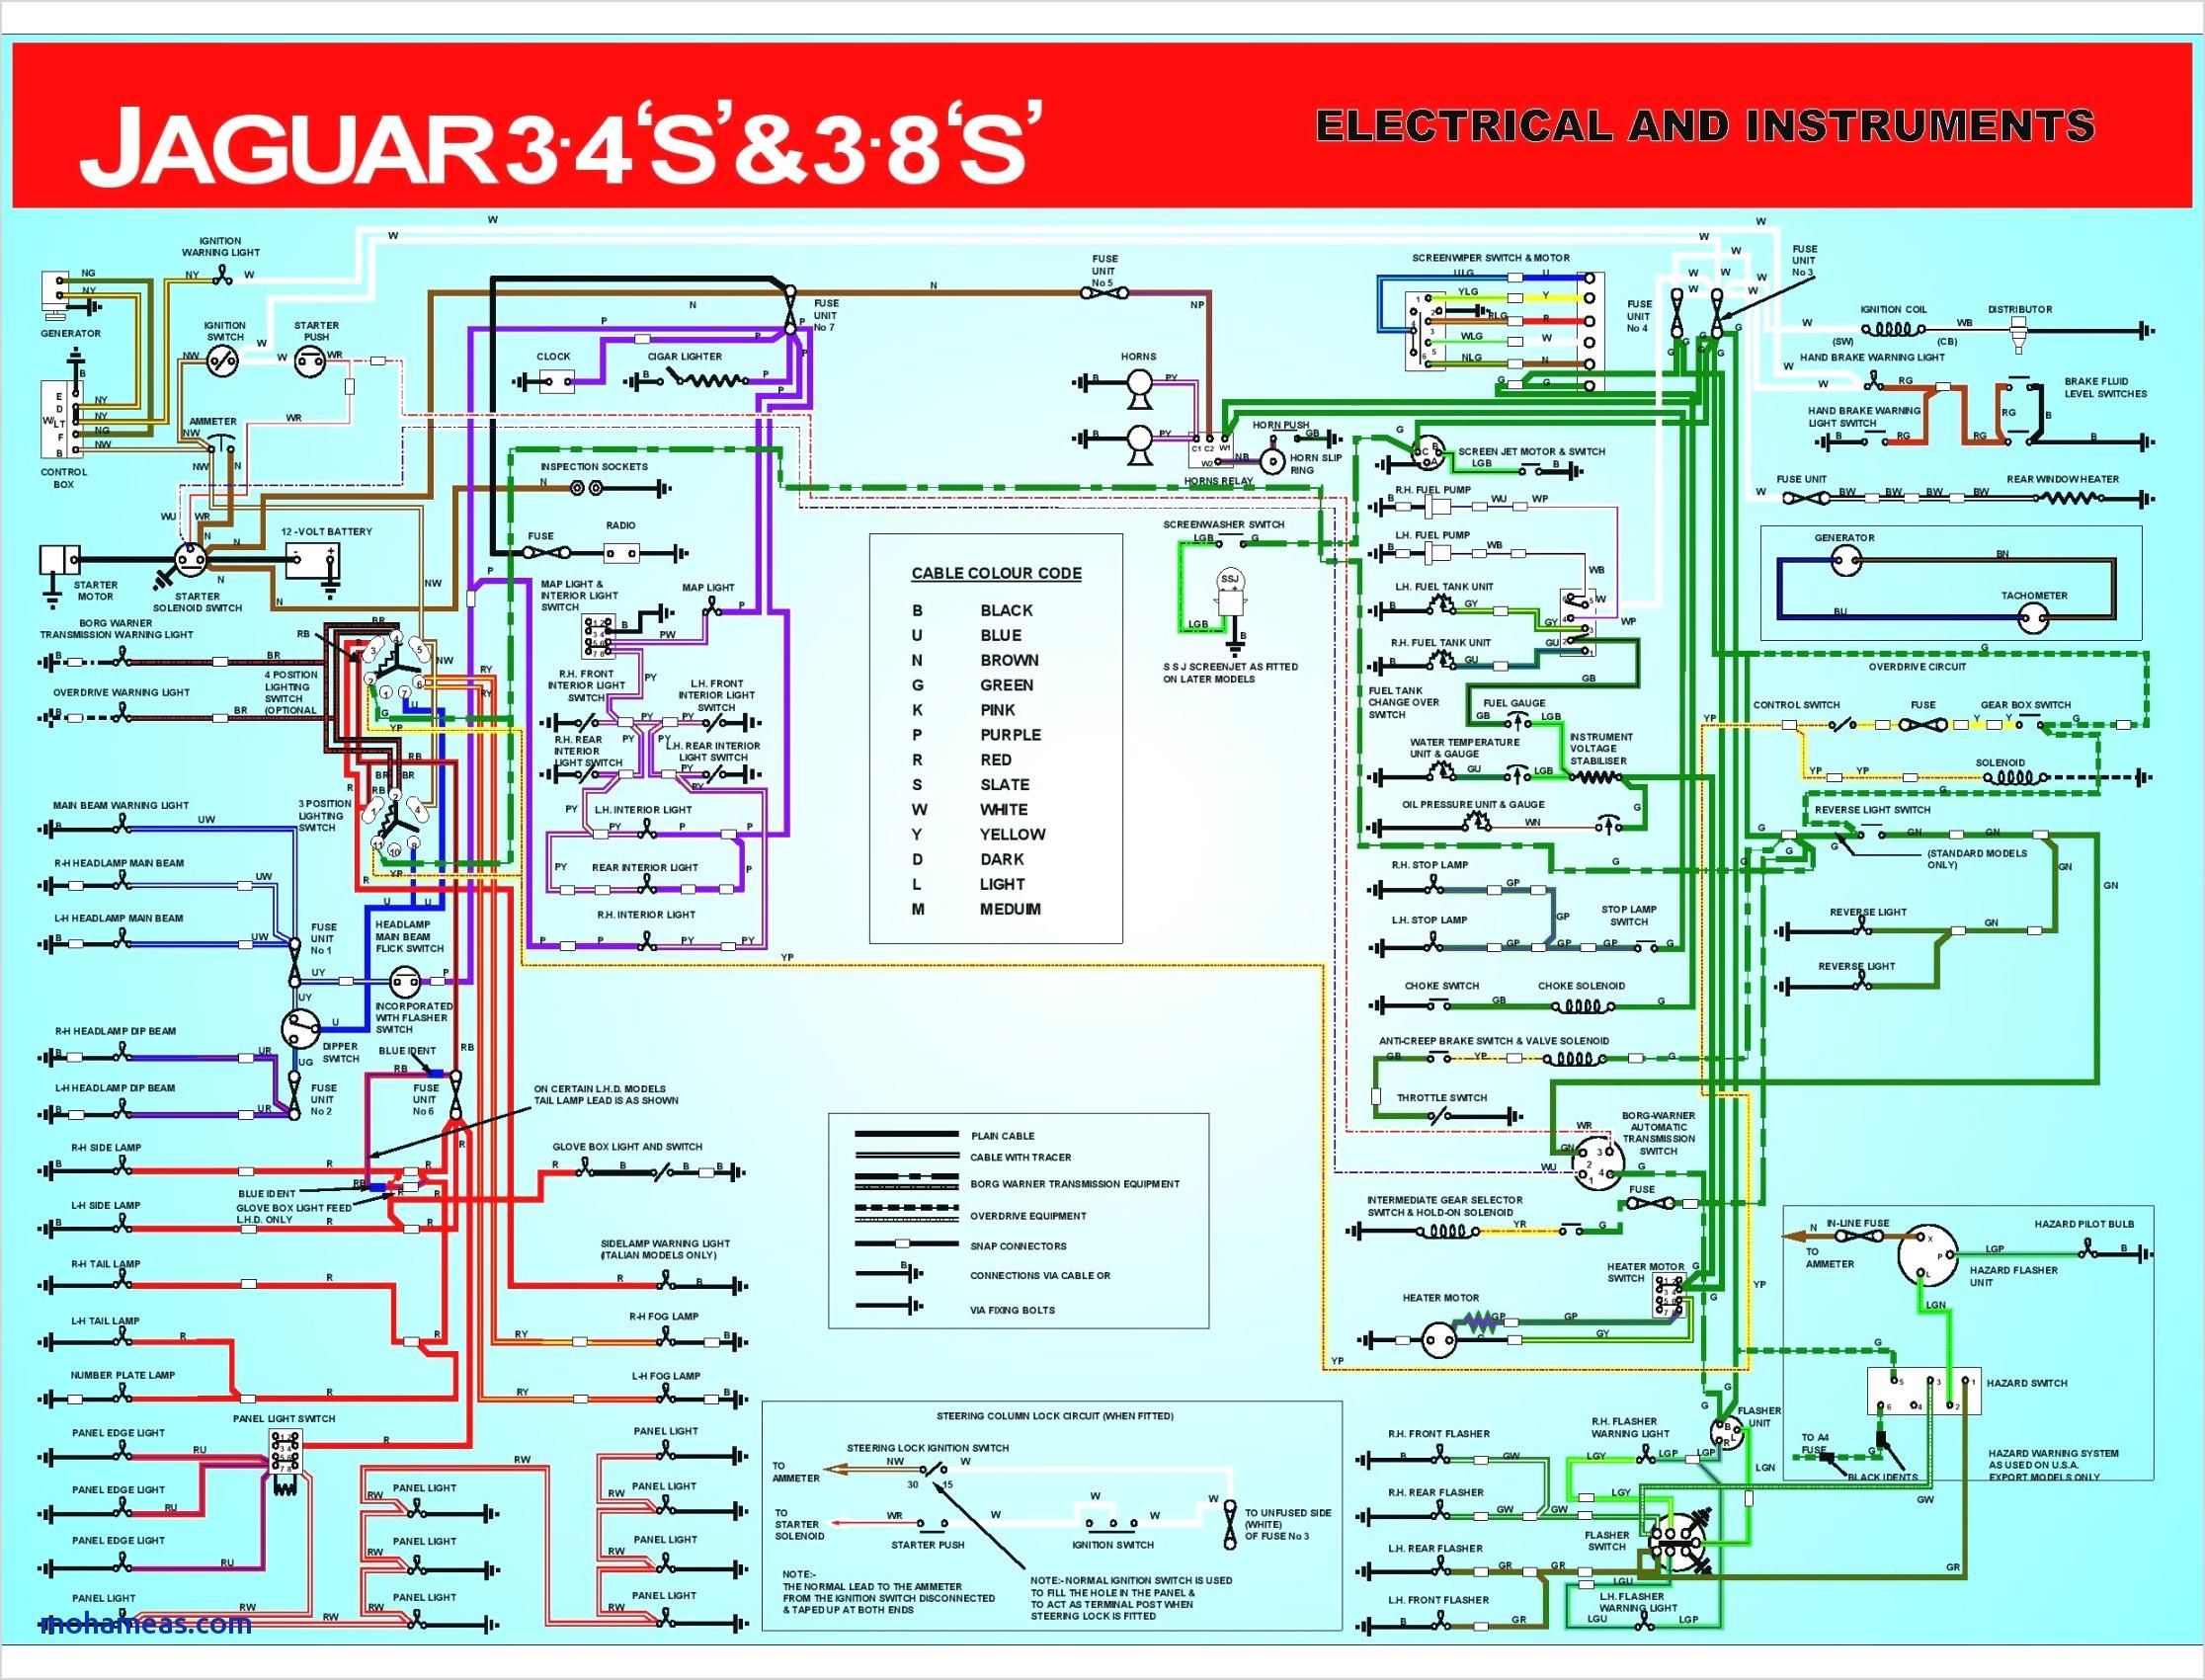 Jaguar S Type Engine Diagram Jaguar X Type Stereo Wiring Diagram Wiring Schematics Diagram Of Jaguar S Type Engine Diagram